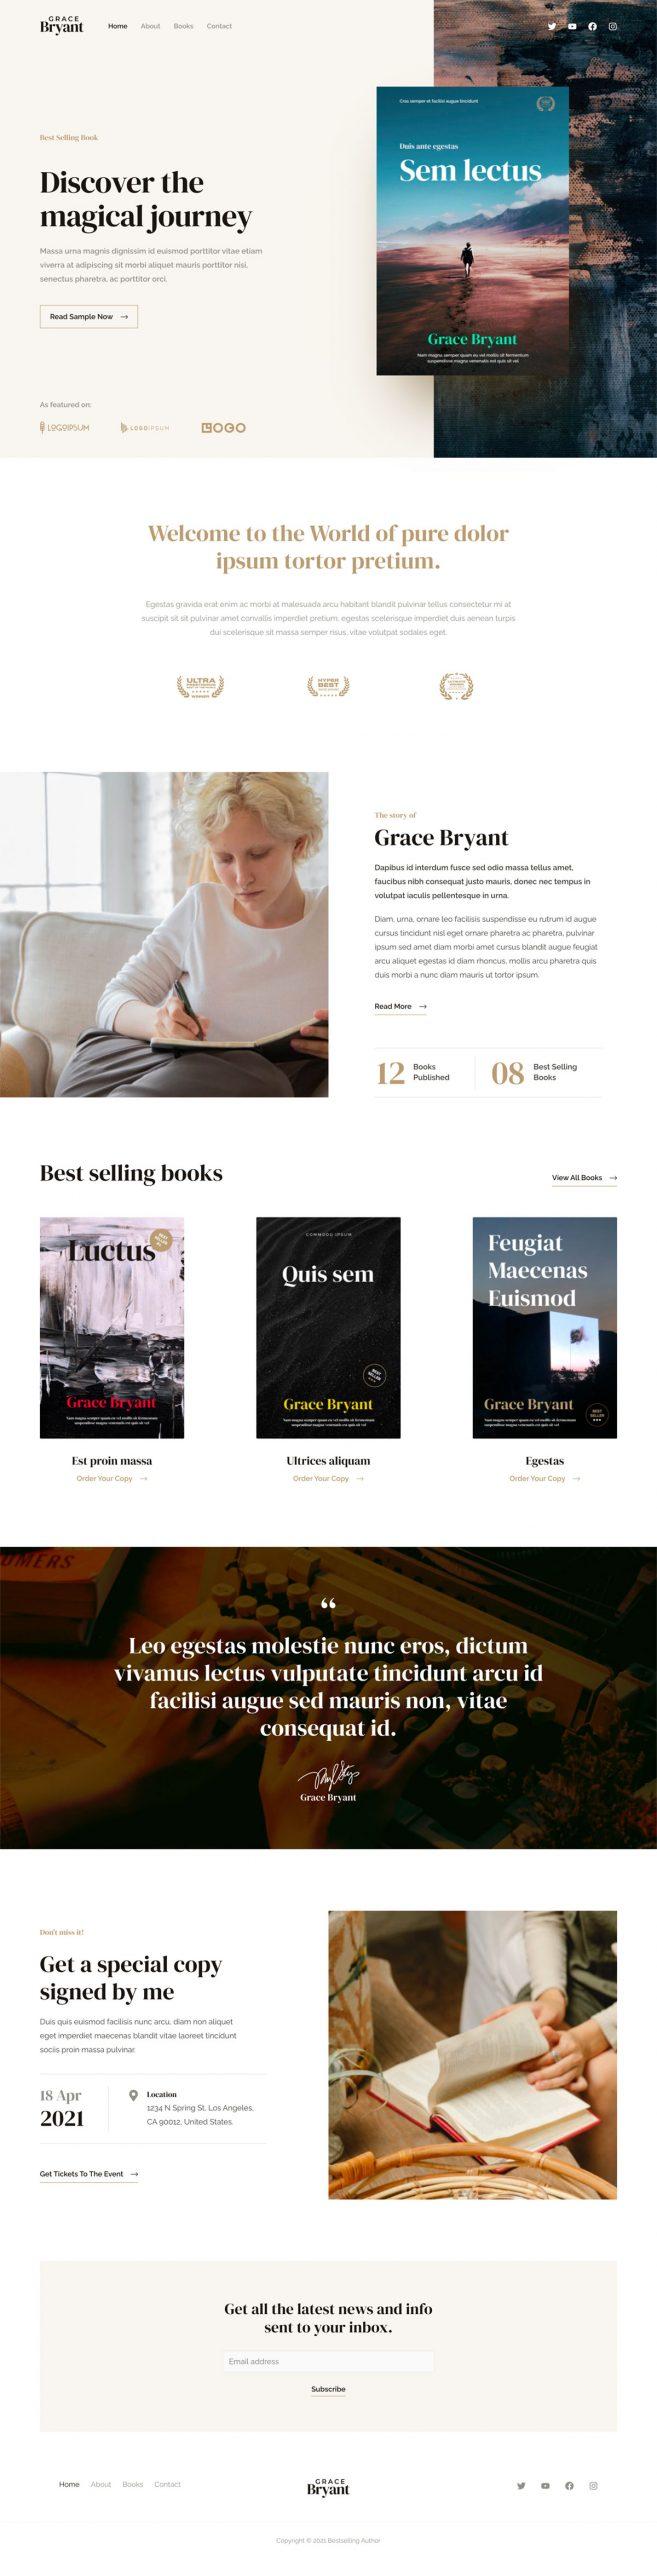 Adamo Web Design | Web Design Durham | bestselling author 02 home scaled